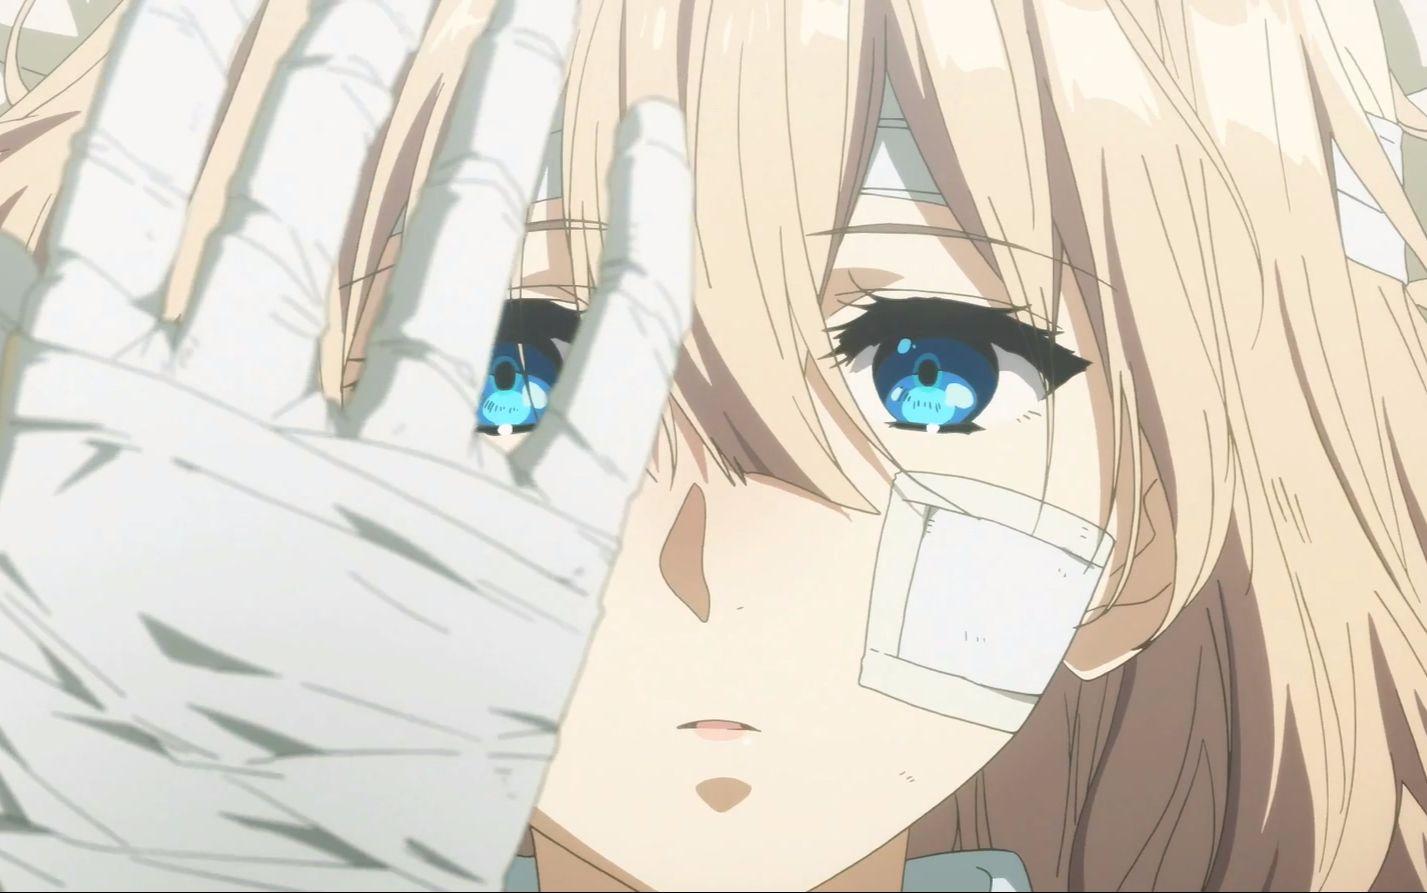 Anime Girl 1080p Wallpaper 紫罗兰永恒花园 标签详情 Bilibili 哔哩哔哩弹幕视频网